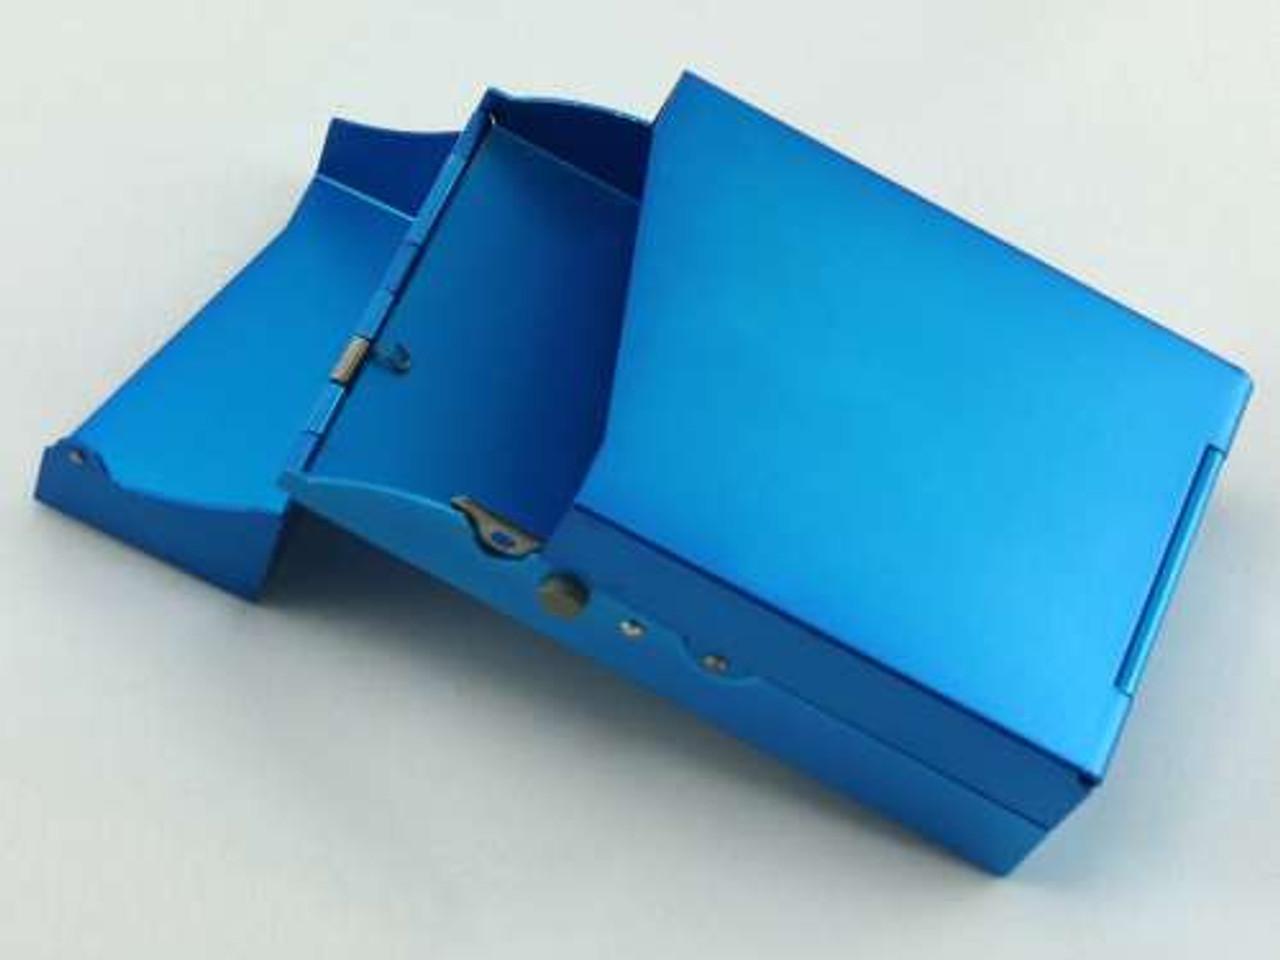 Blue Auto Cigarette Pack Holder